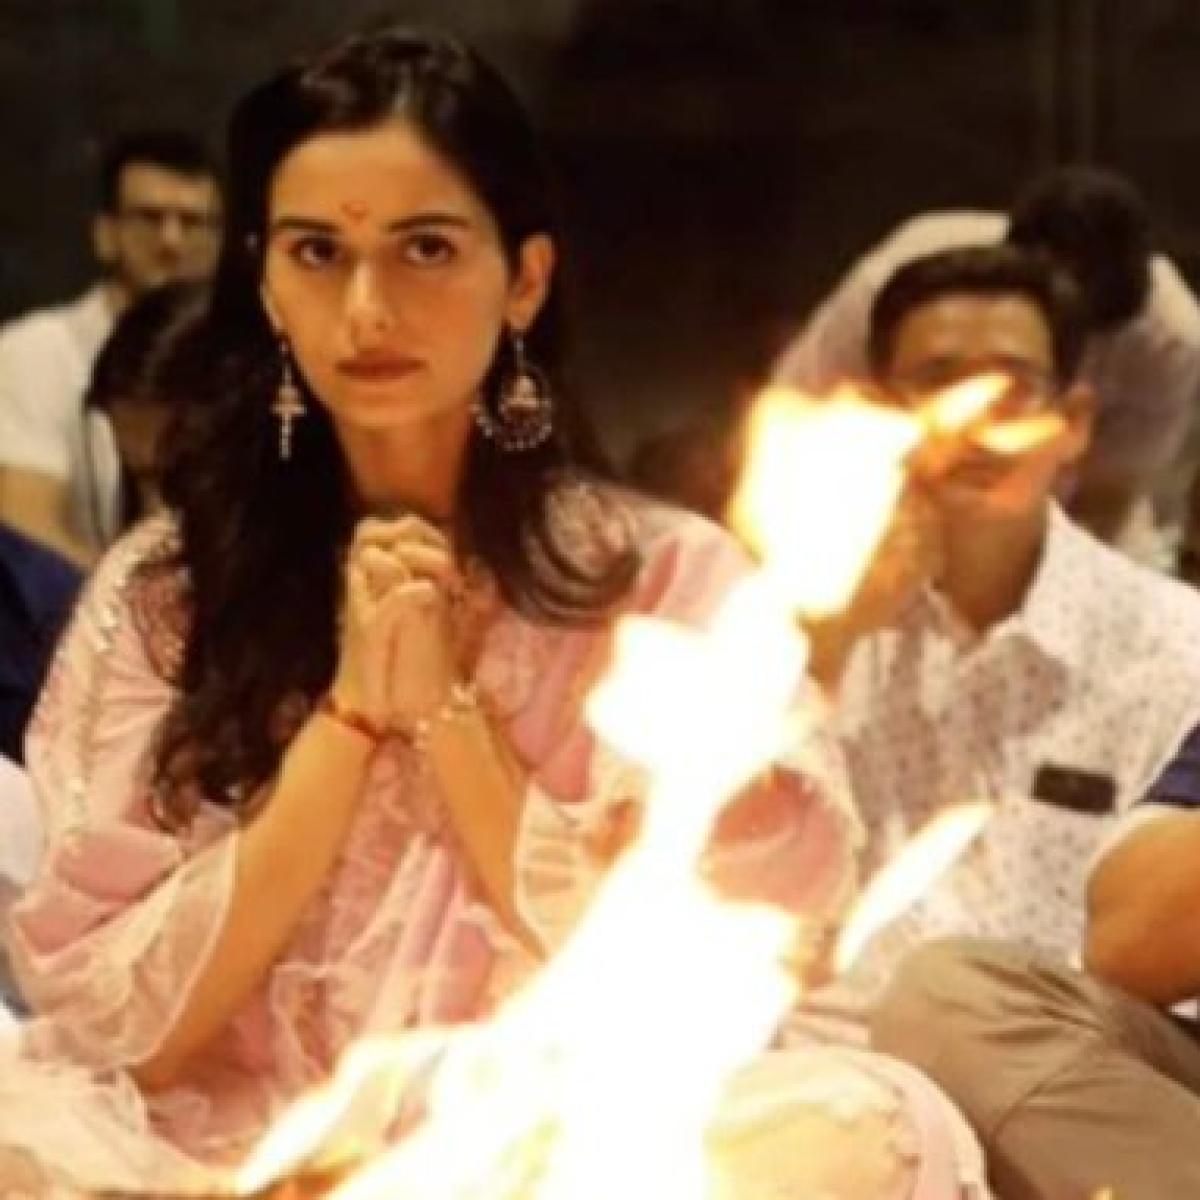 Akshay Kumar's 'Prithviraj' to be based on THIS epic poem by Chand Bardai